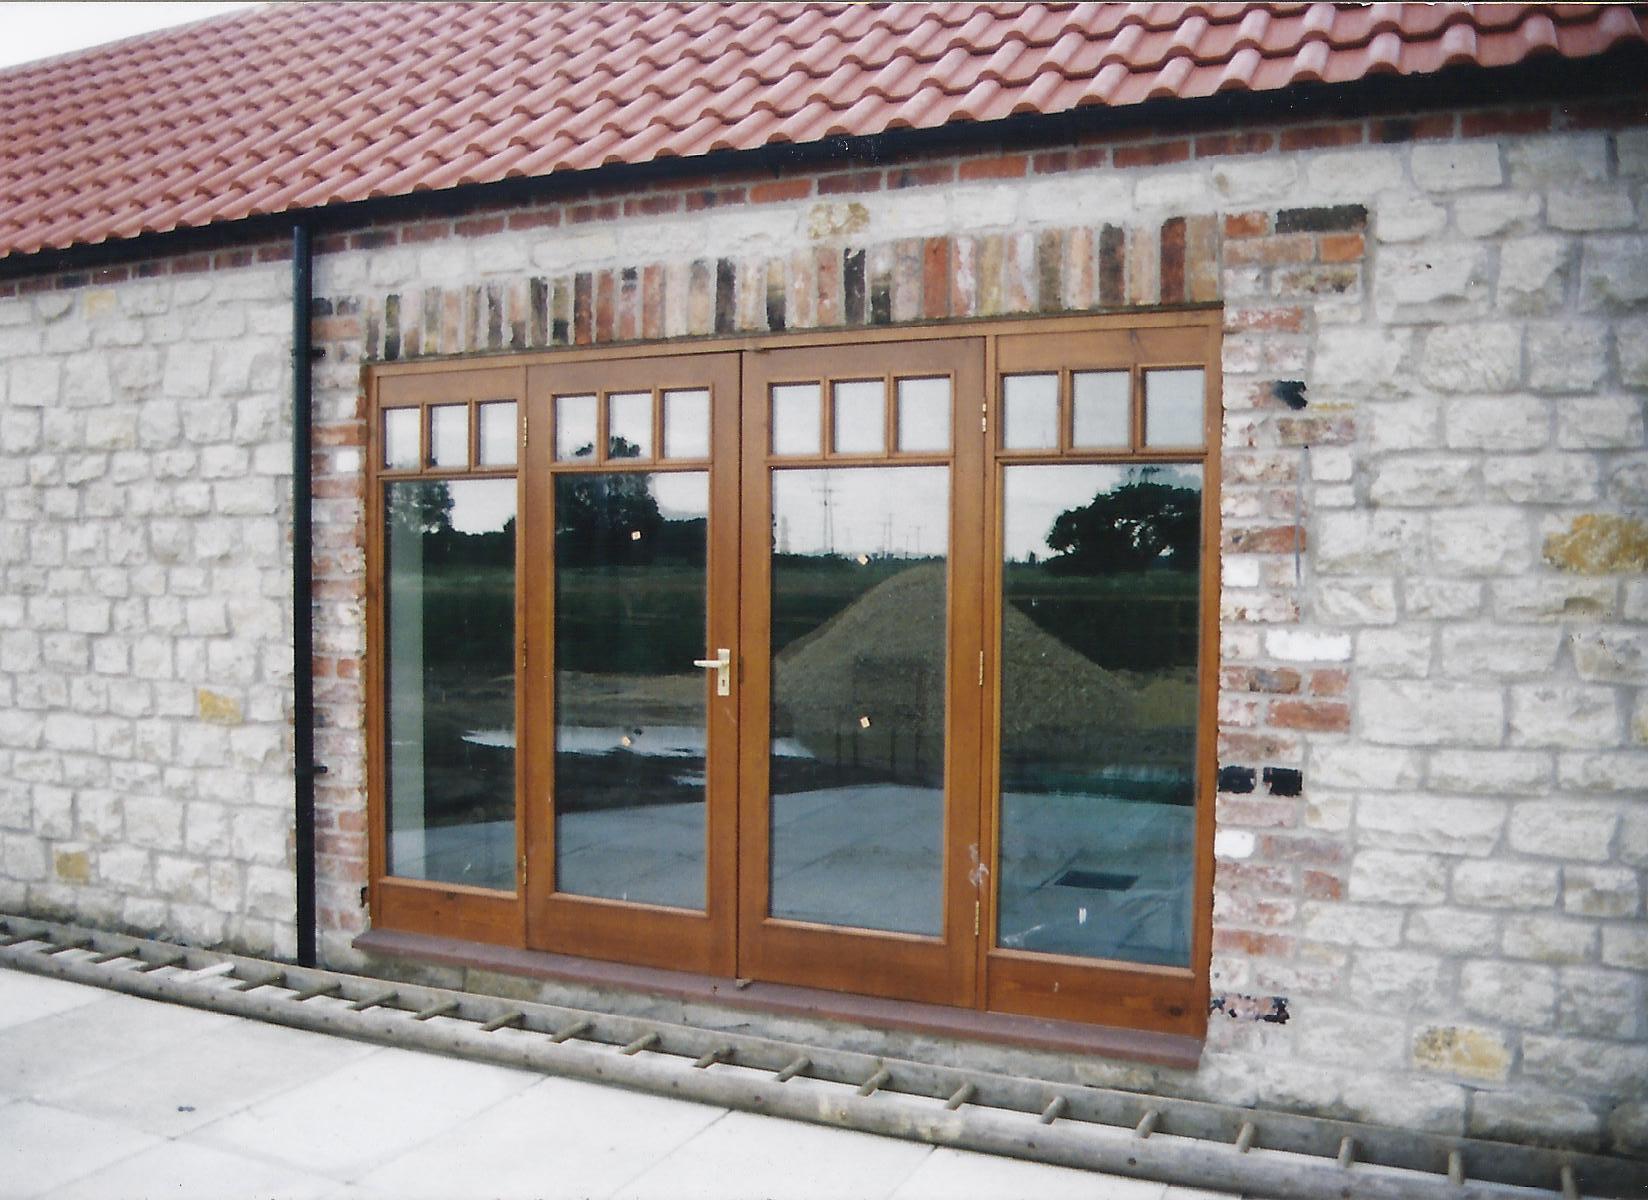 Brecks Farm Construction 9 - East Yorkshire Architects - Samuel Kendall Associates.jpg